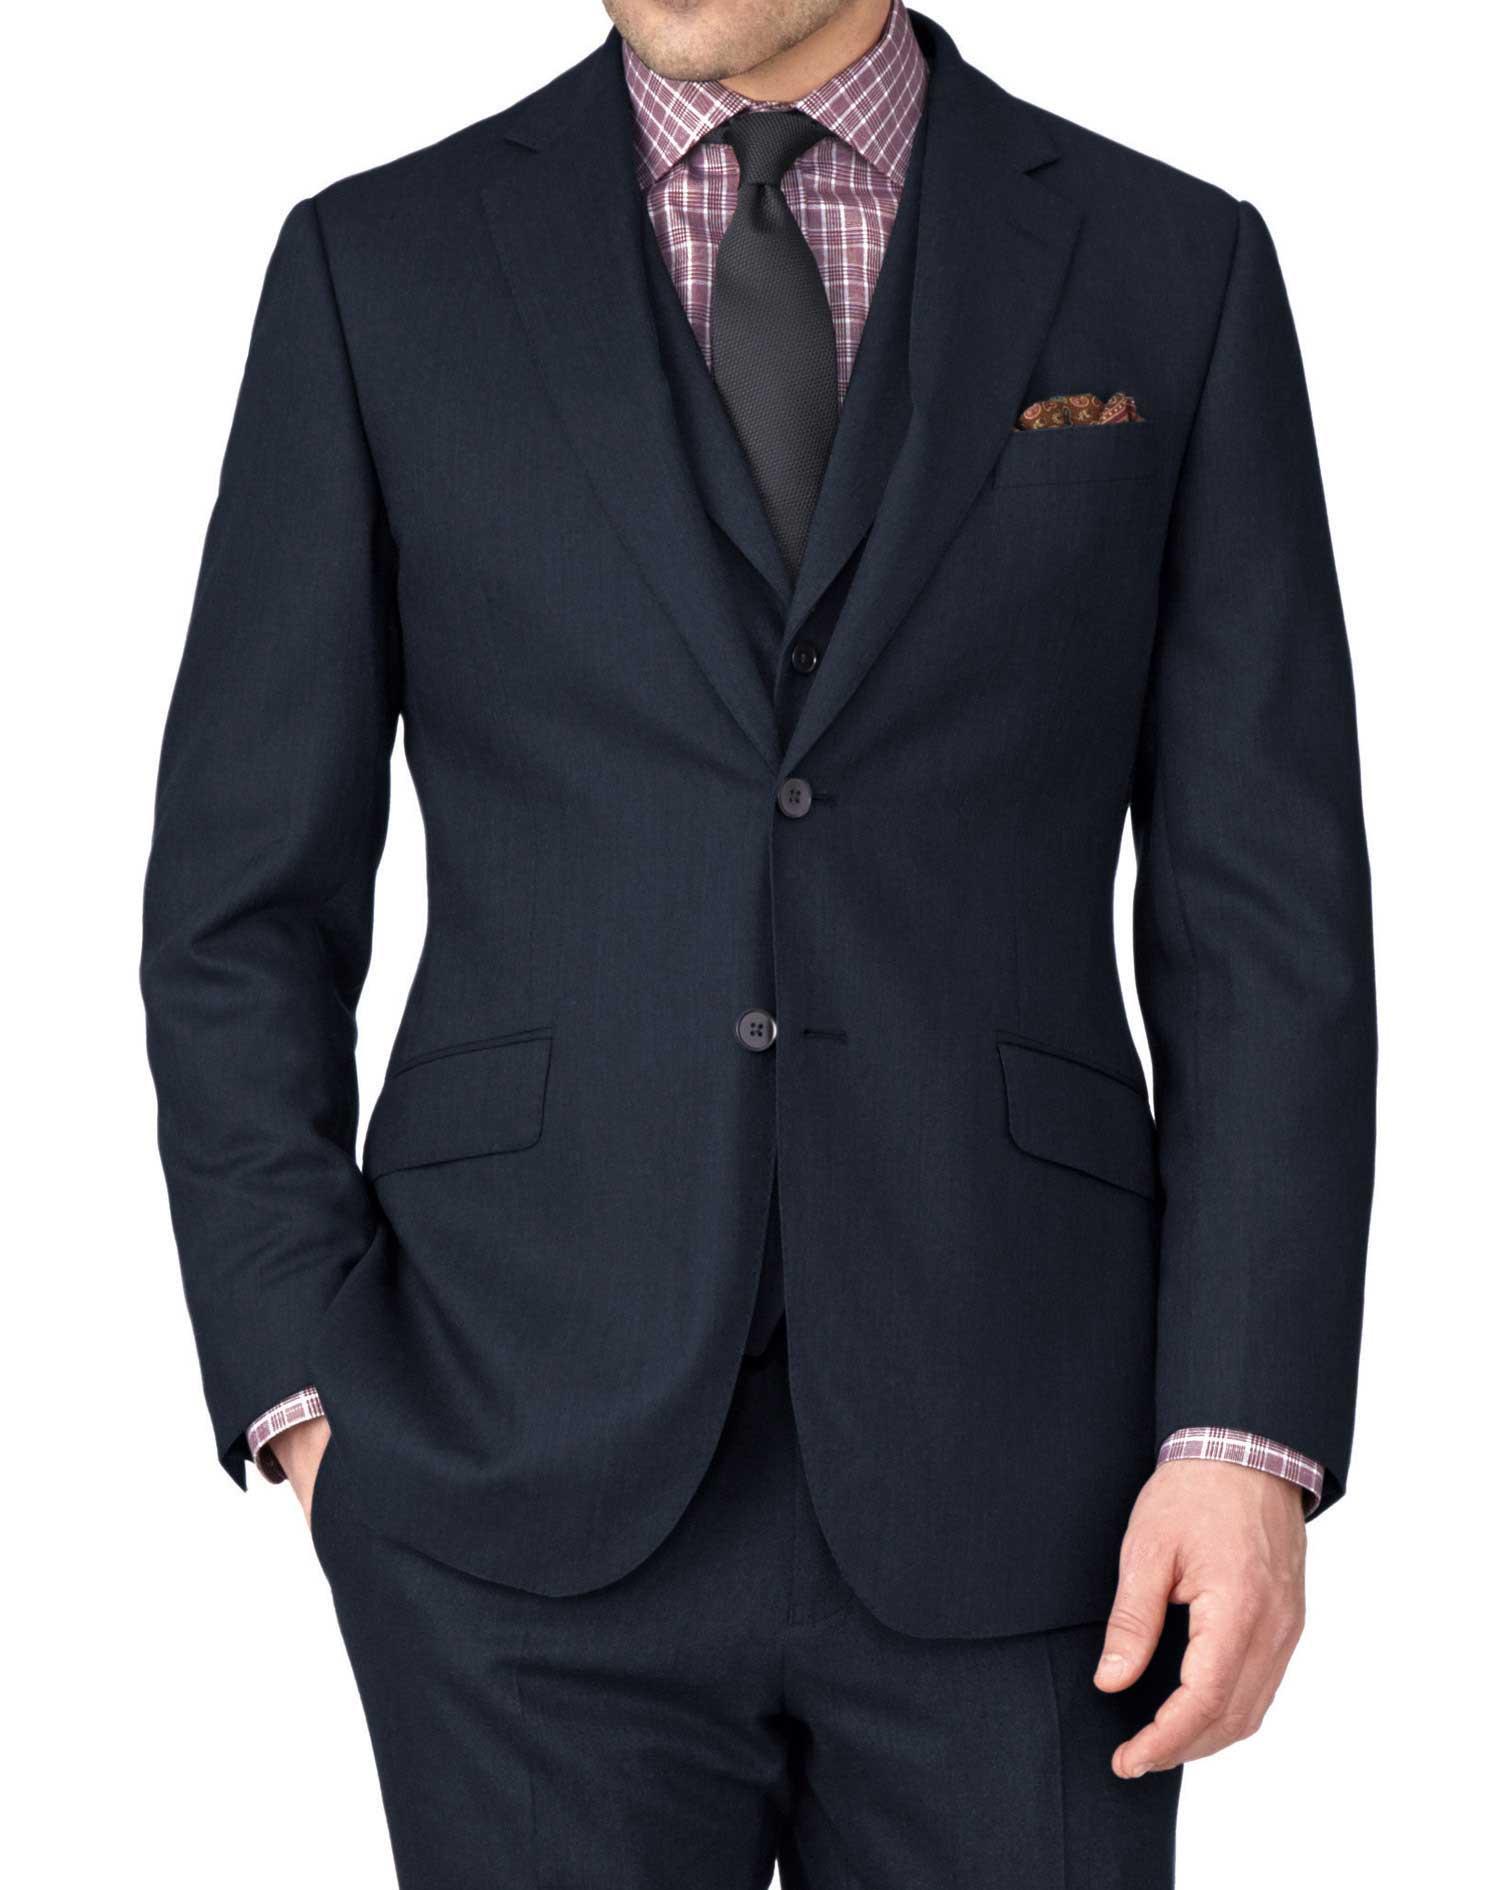 Indigo Slim Fit Saxony Business Suit Wool Jacket Size 36 Short by Charles Tyrwhitt